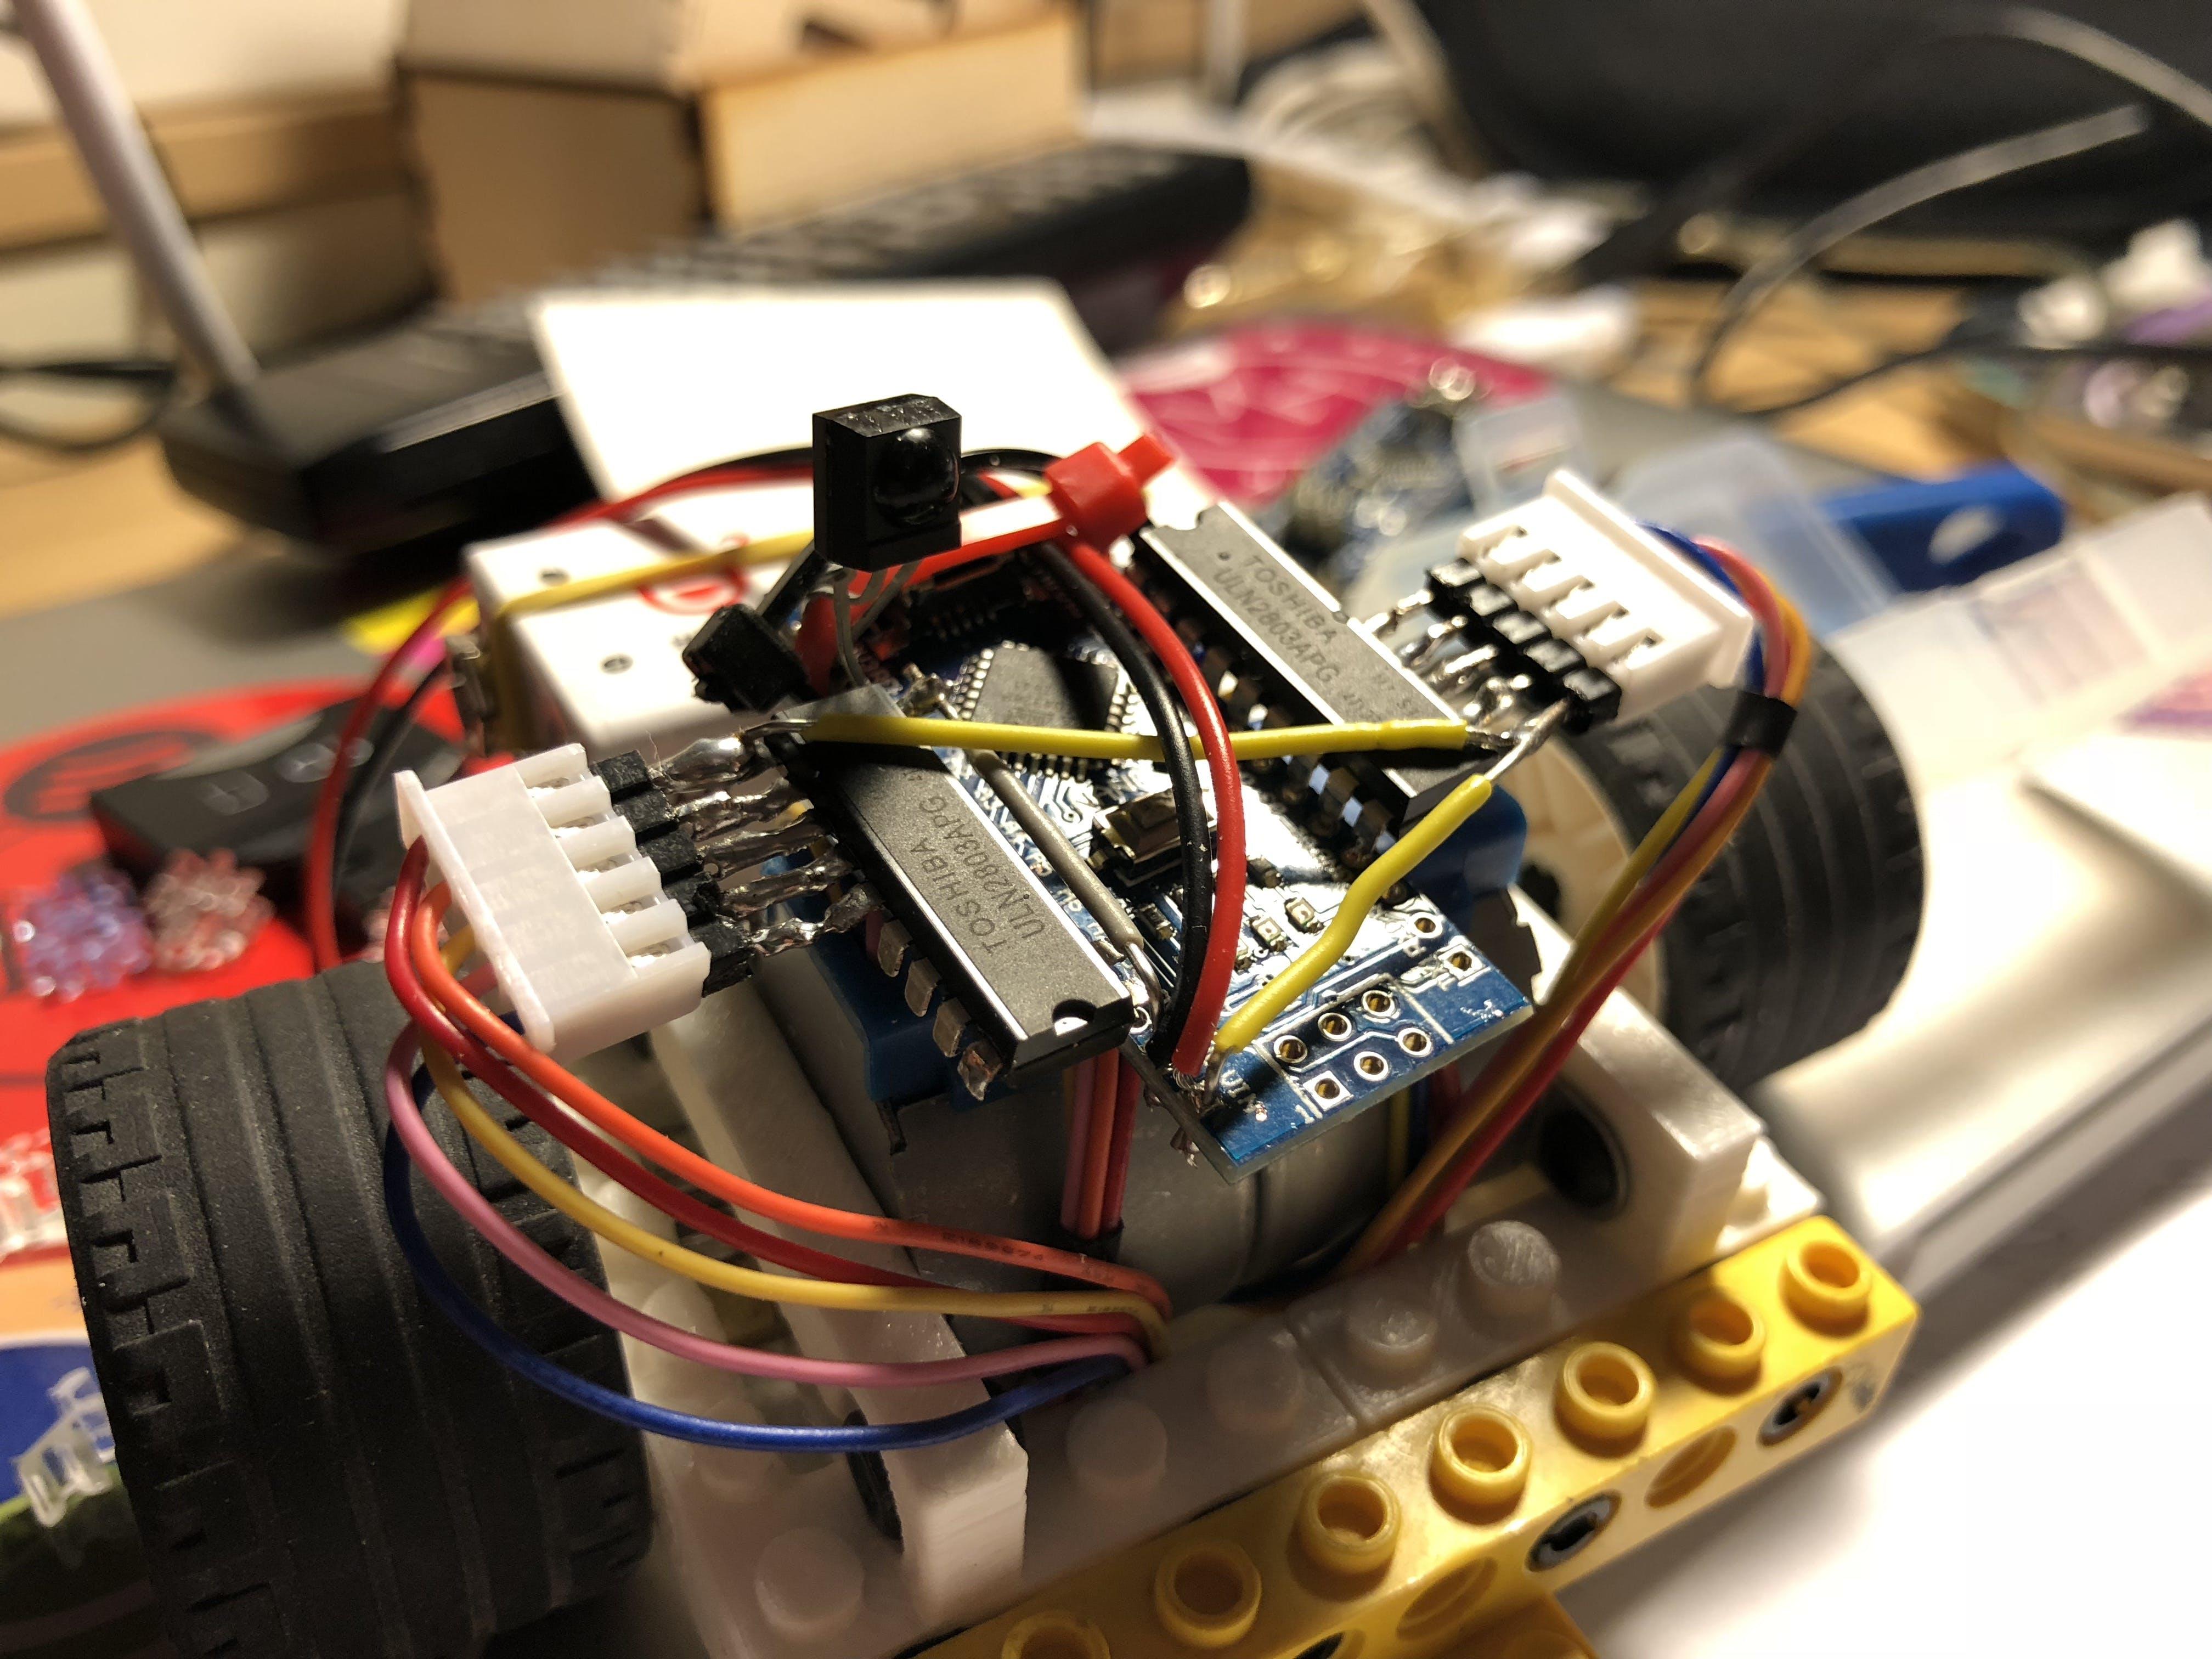 3D-electronics! Nano+2xULN2803+TSOP4838+Piezo Buzzer. All soldered together...